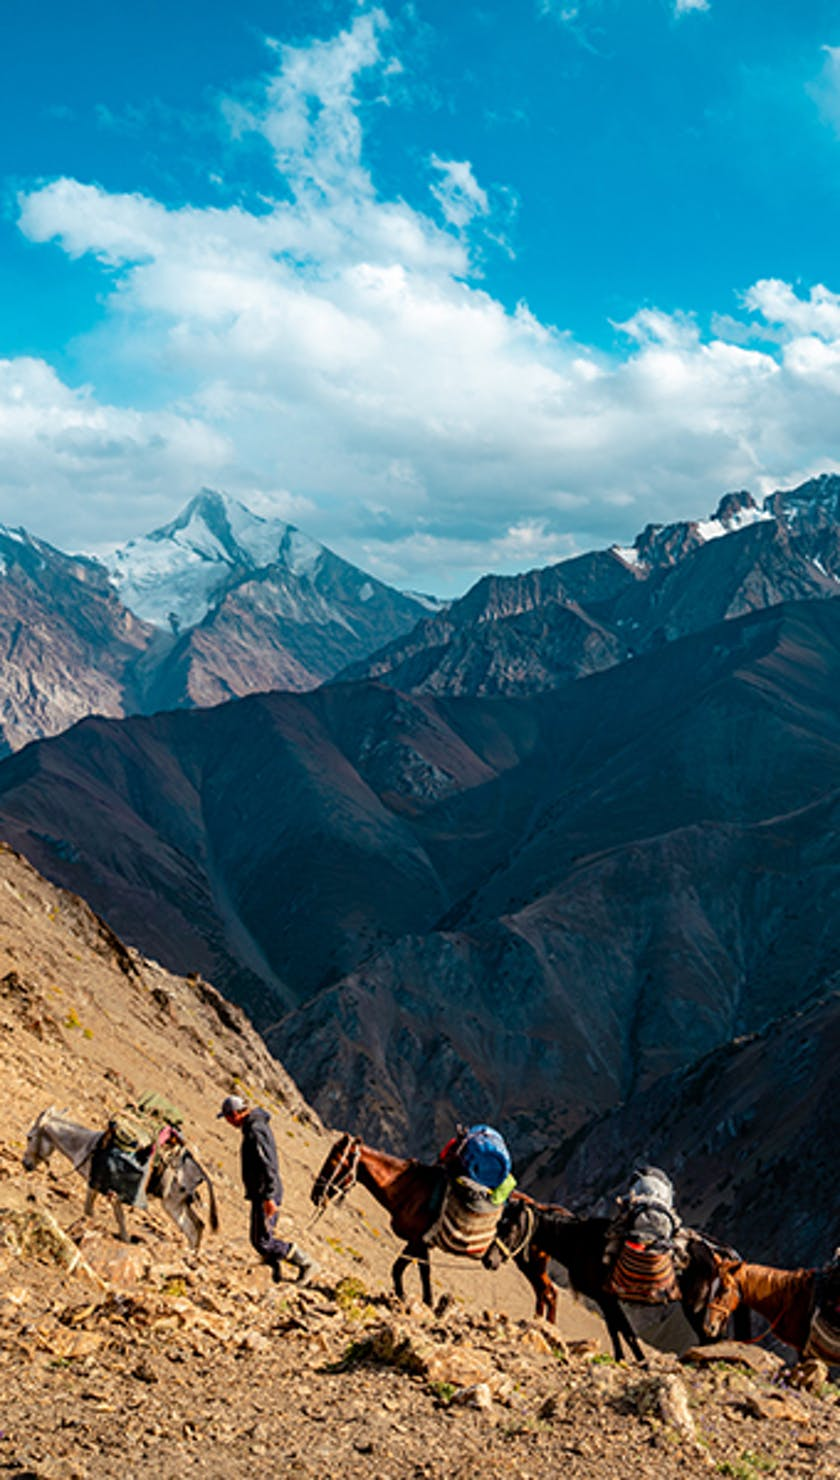 Trekkers on a mountain trail